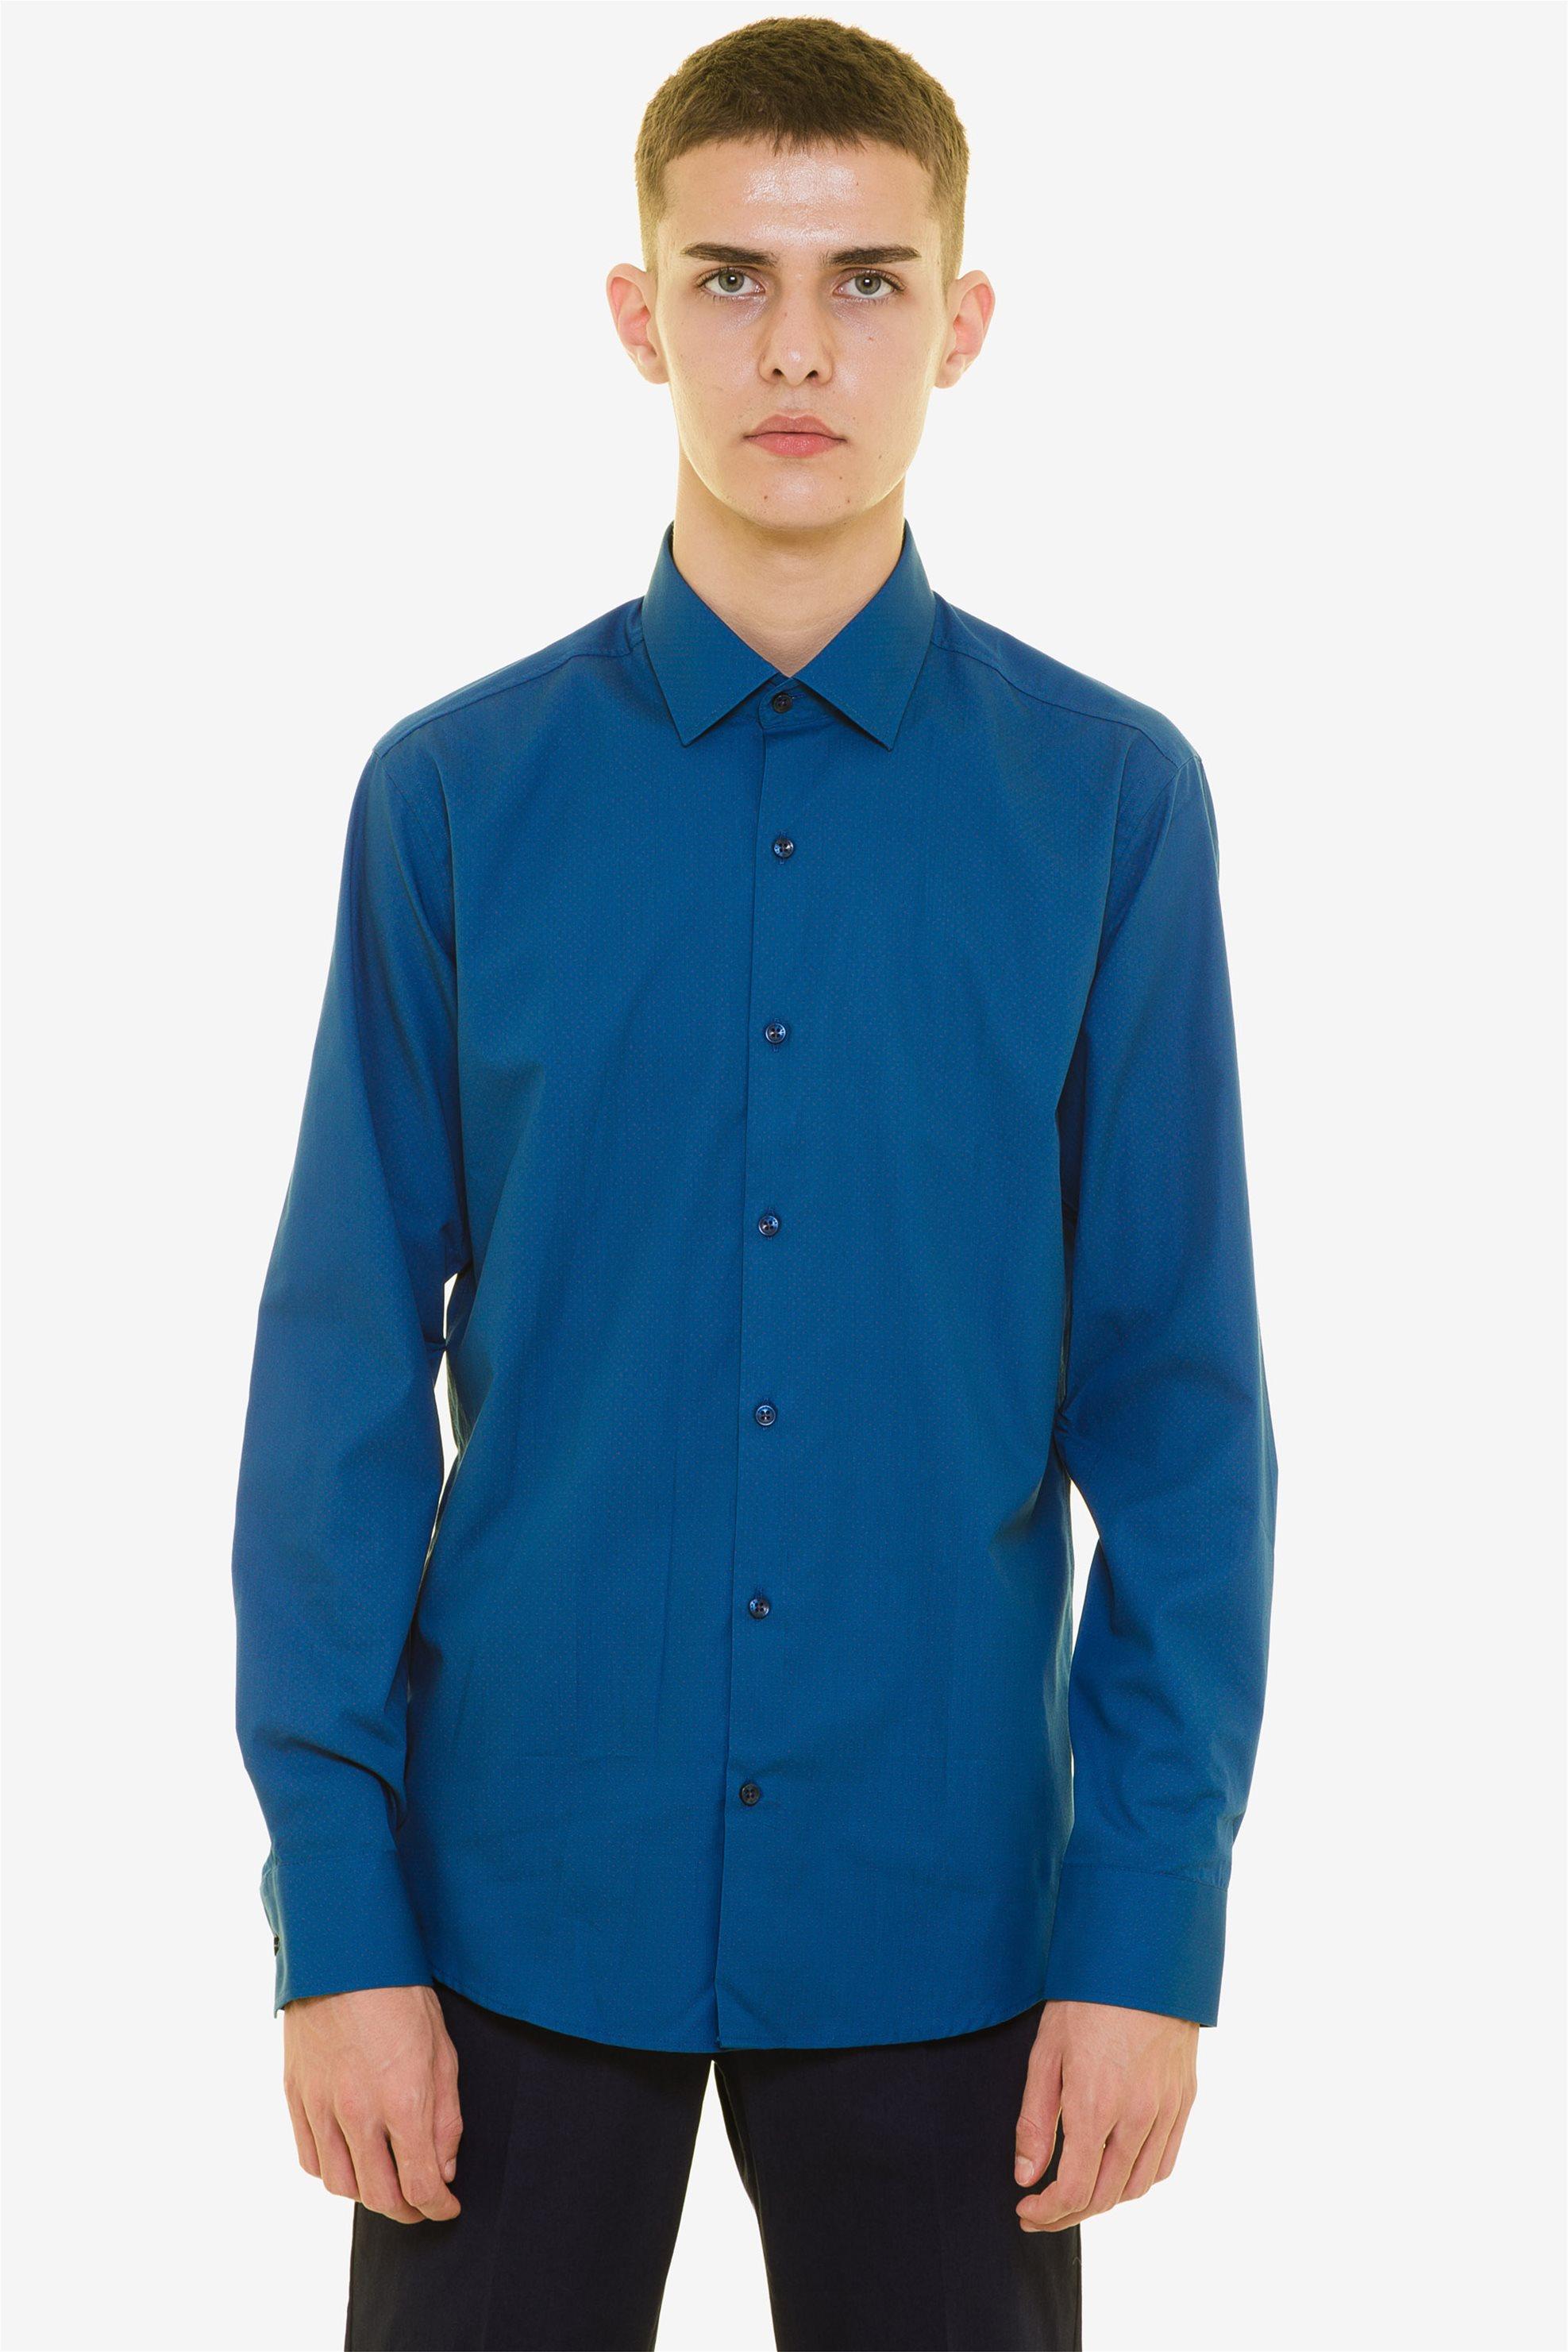 The Bostonians ανδρικό πουκάμισο με μικροσχέδιο πουά - ACP1617 - Μπλε